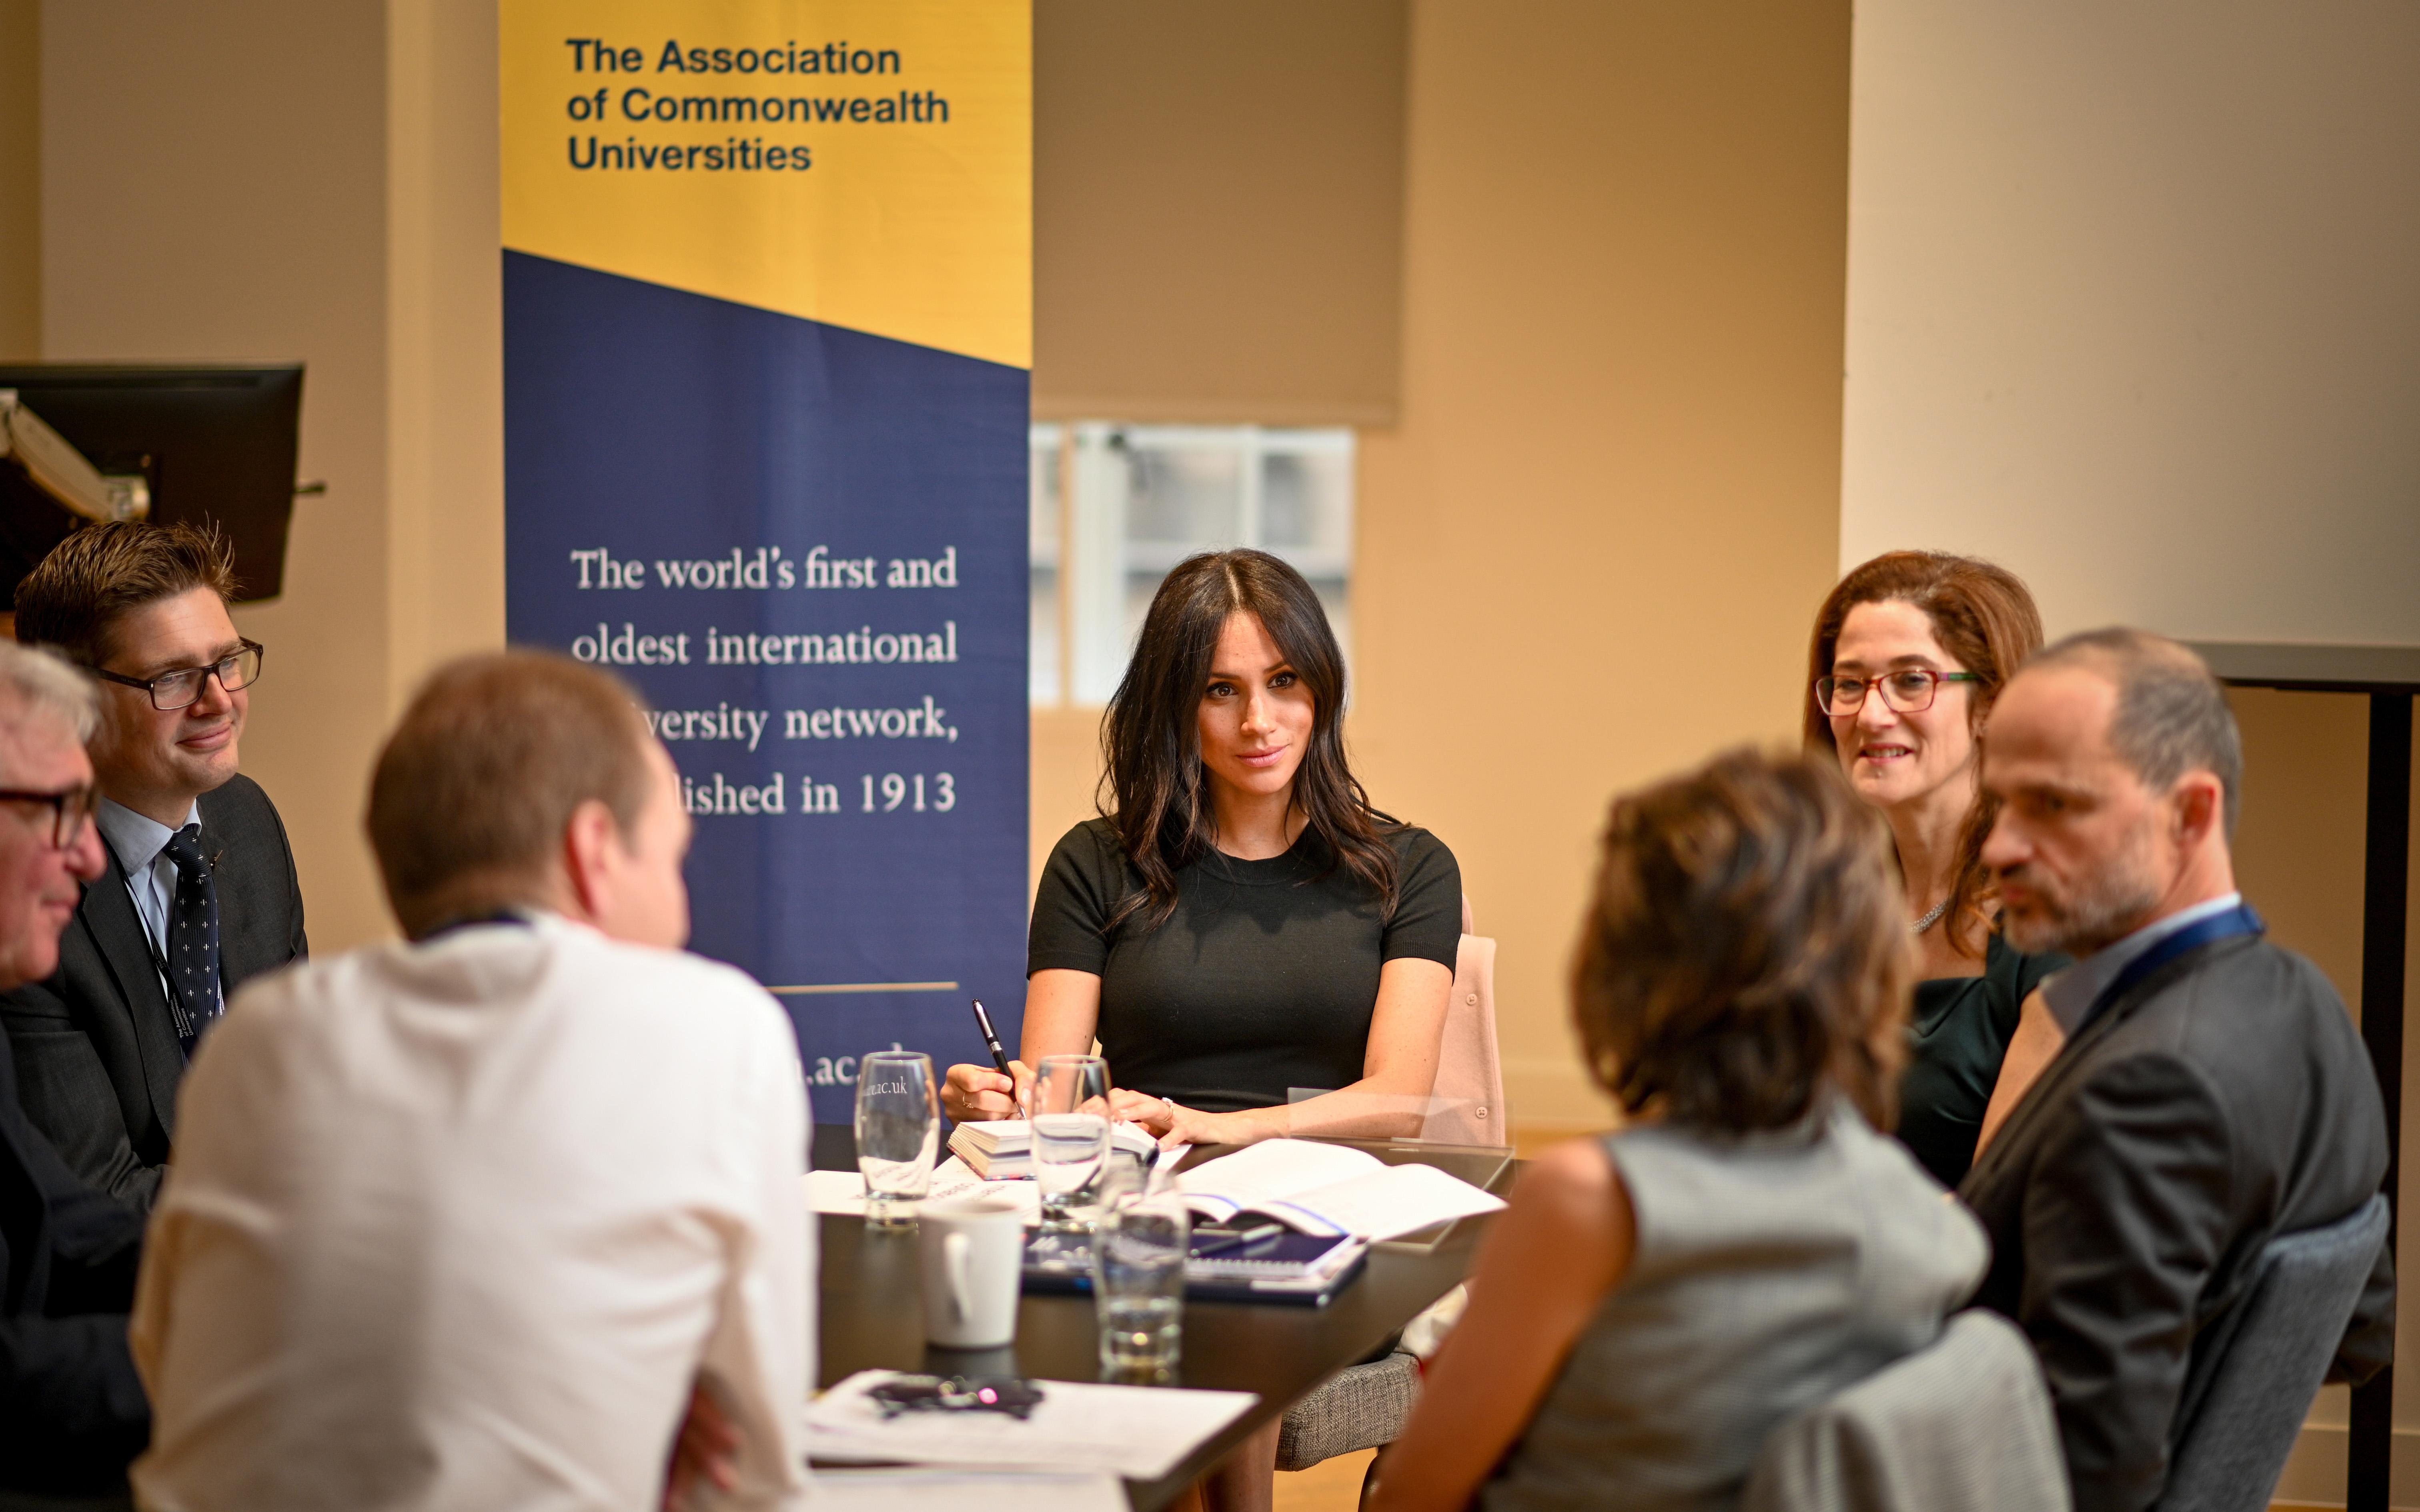 Association of Commonwealth Universities event